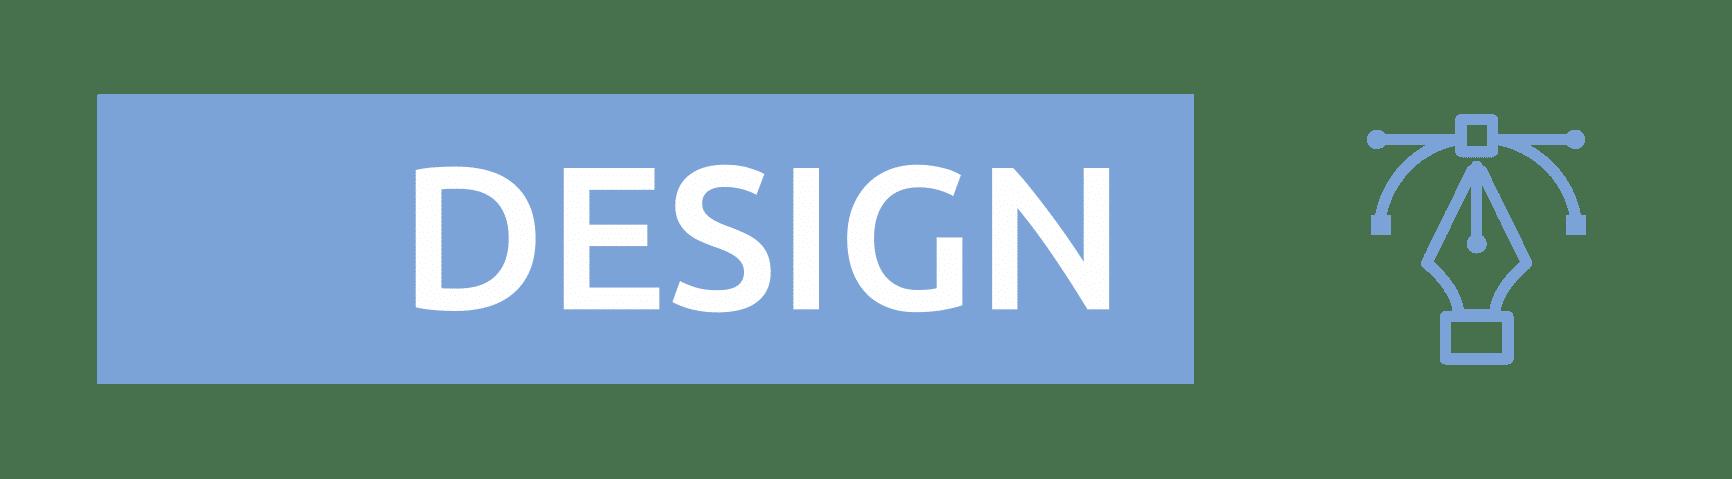 Design-Icon-1